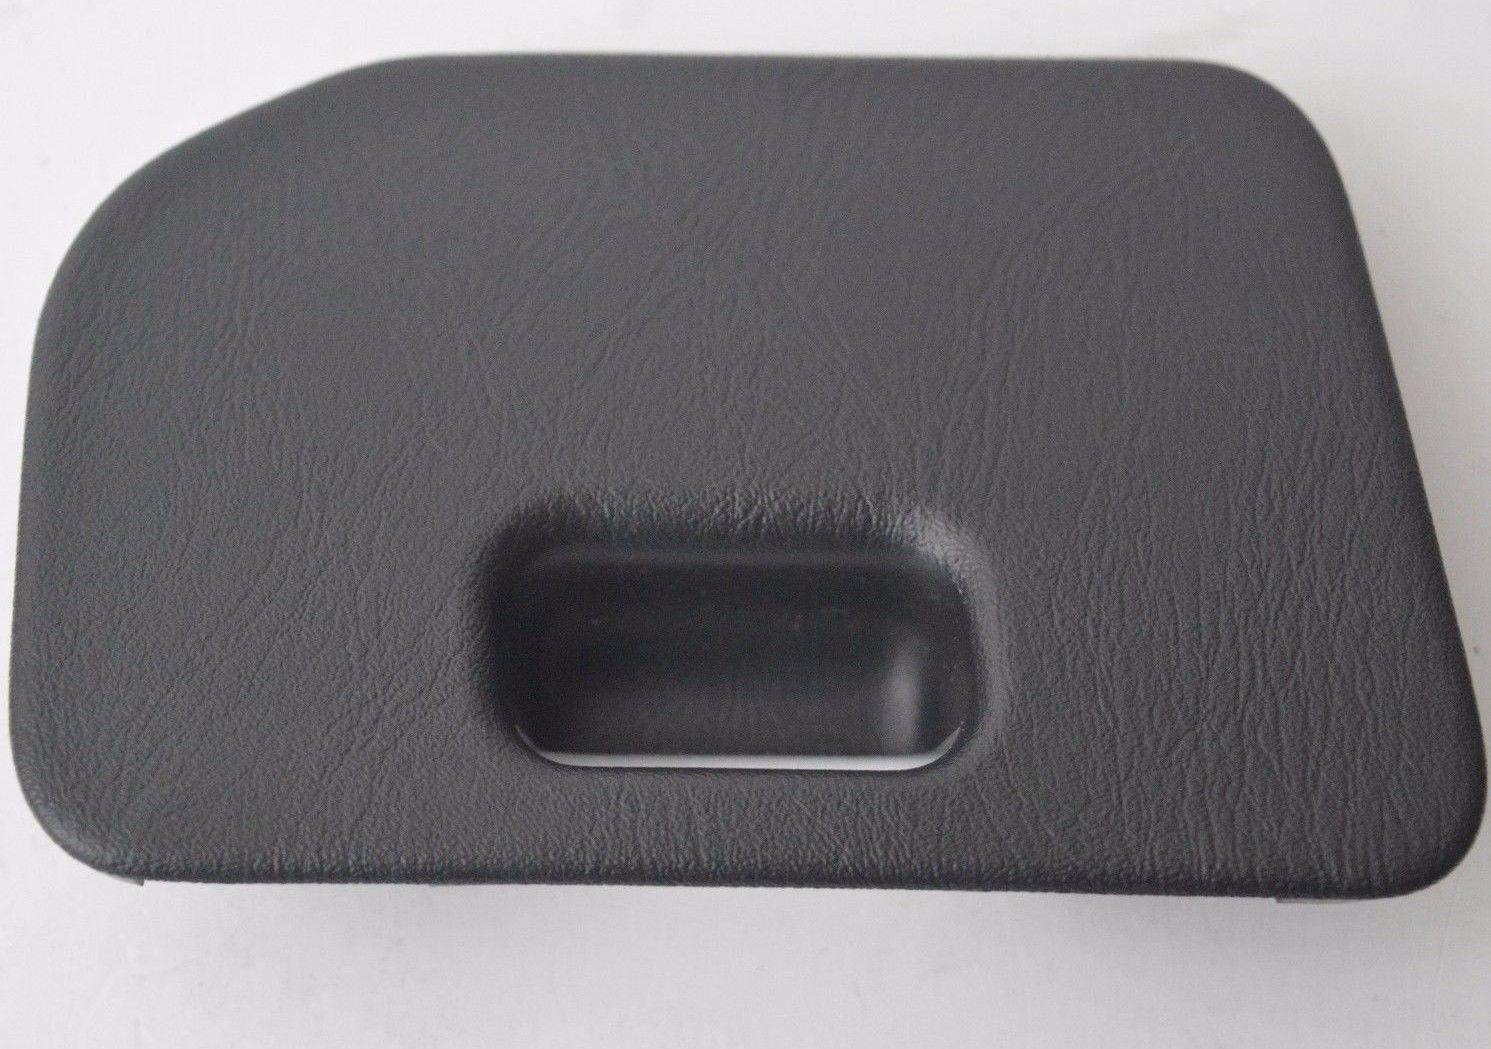 00 01 02 03 2000 Nissan Maxima Black Fuse And 50 Similar Items 2002 Box Cover Block Lid Door Panel